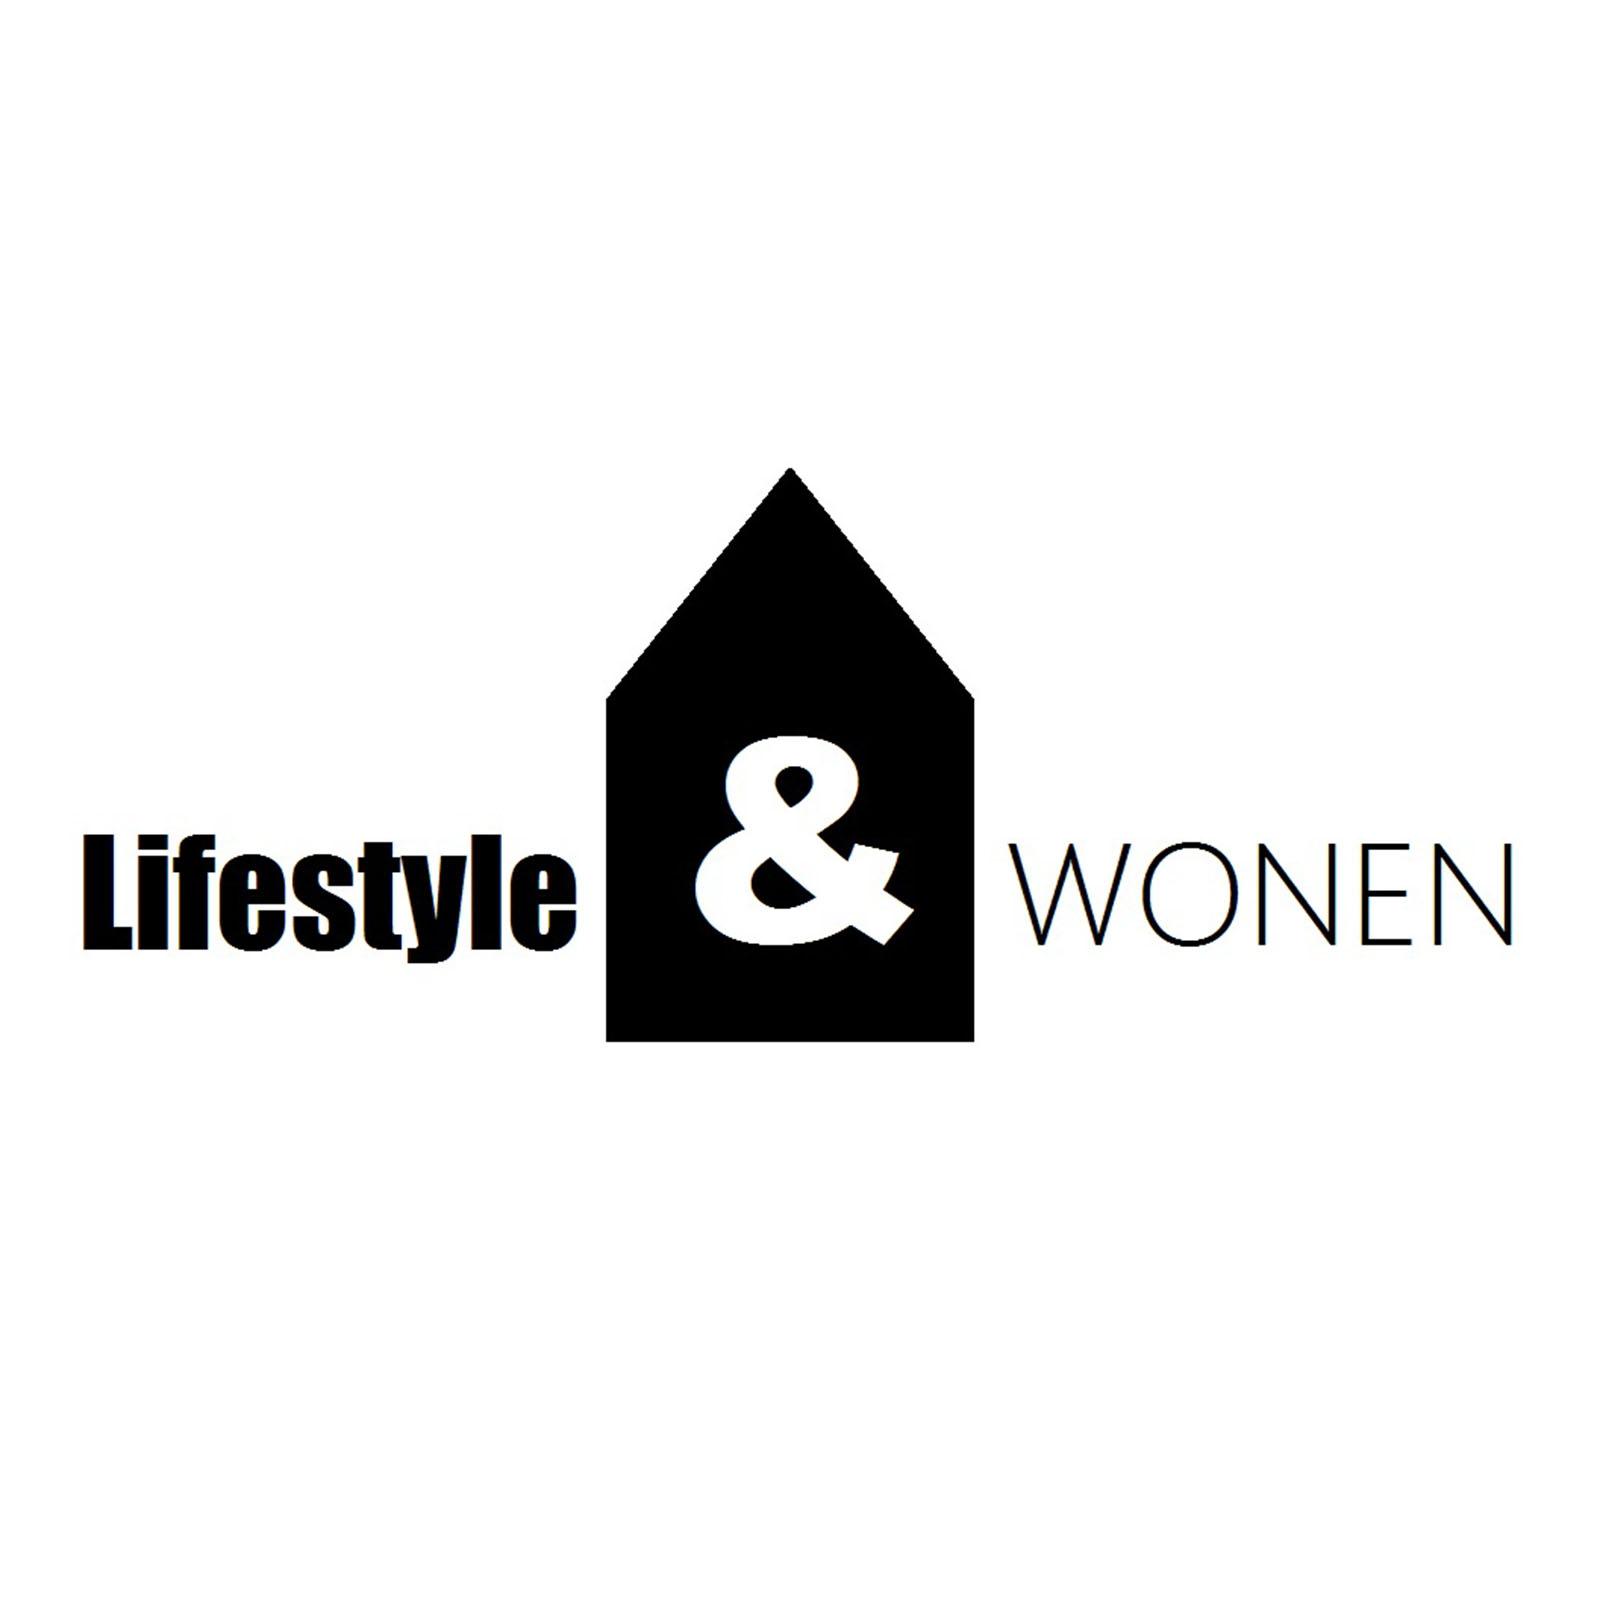 Lifestyle & Wonen